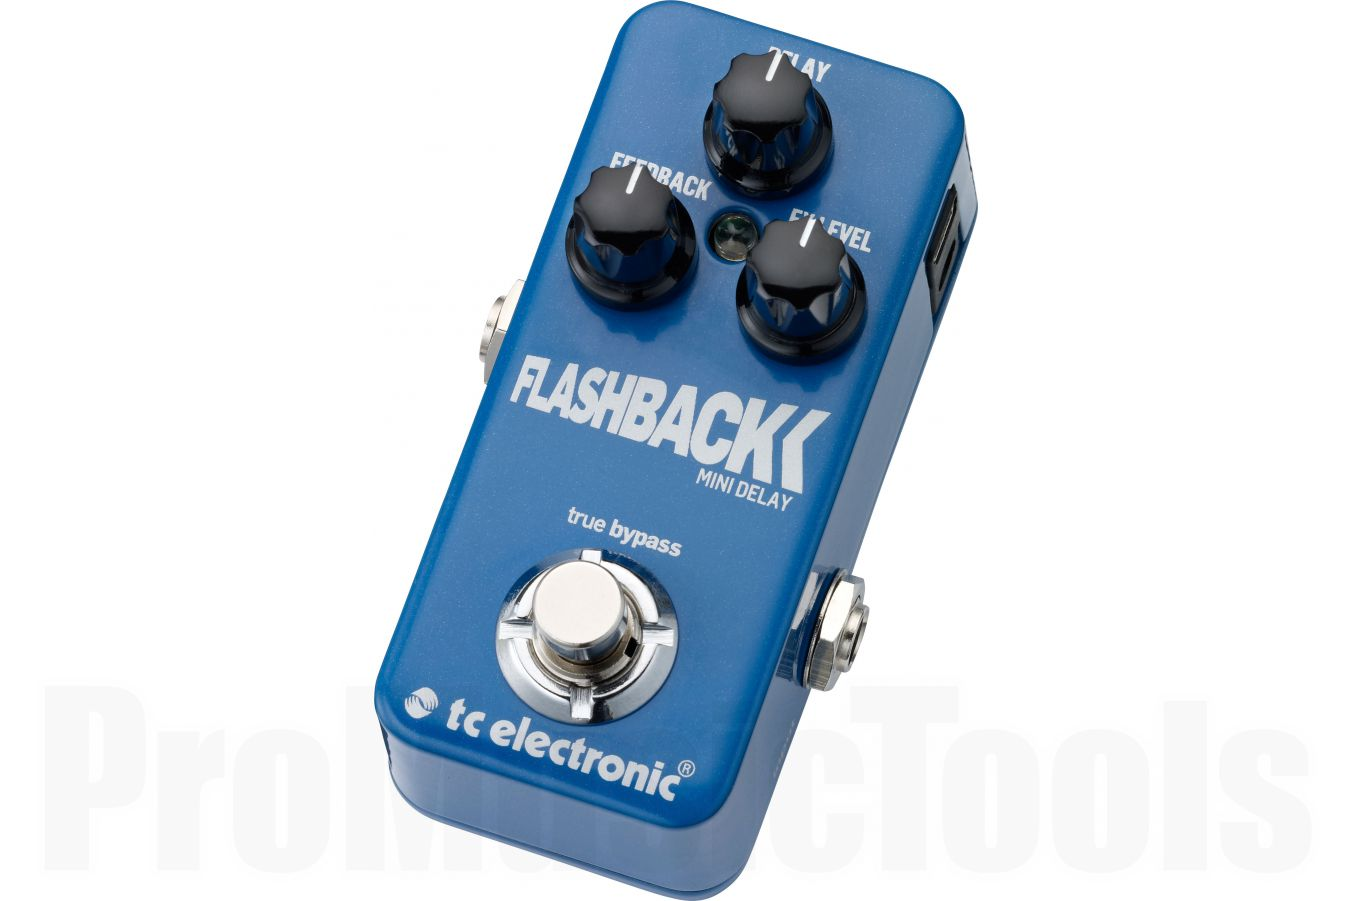 TC Electronic Flashback Mini Delay - b-stock (1x opened box)